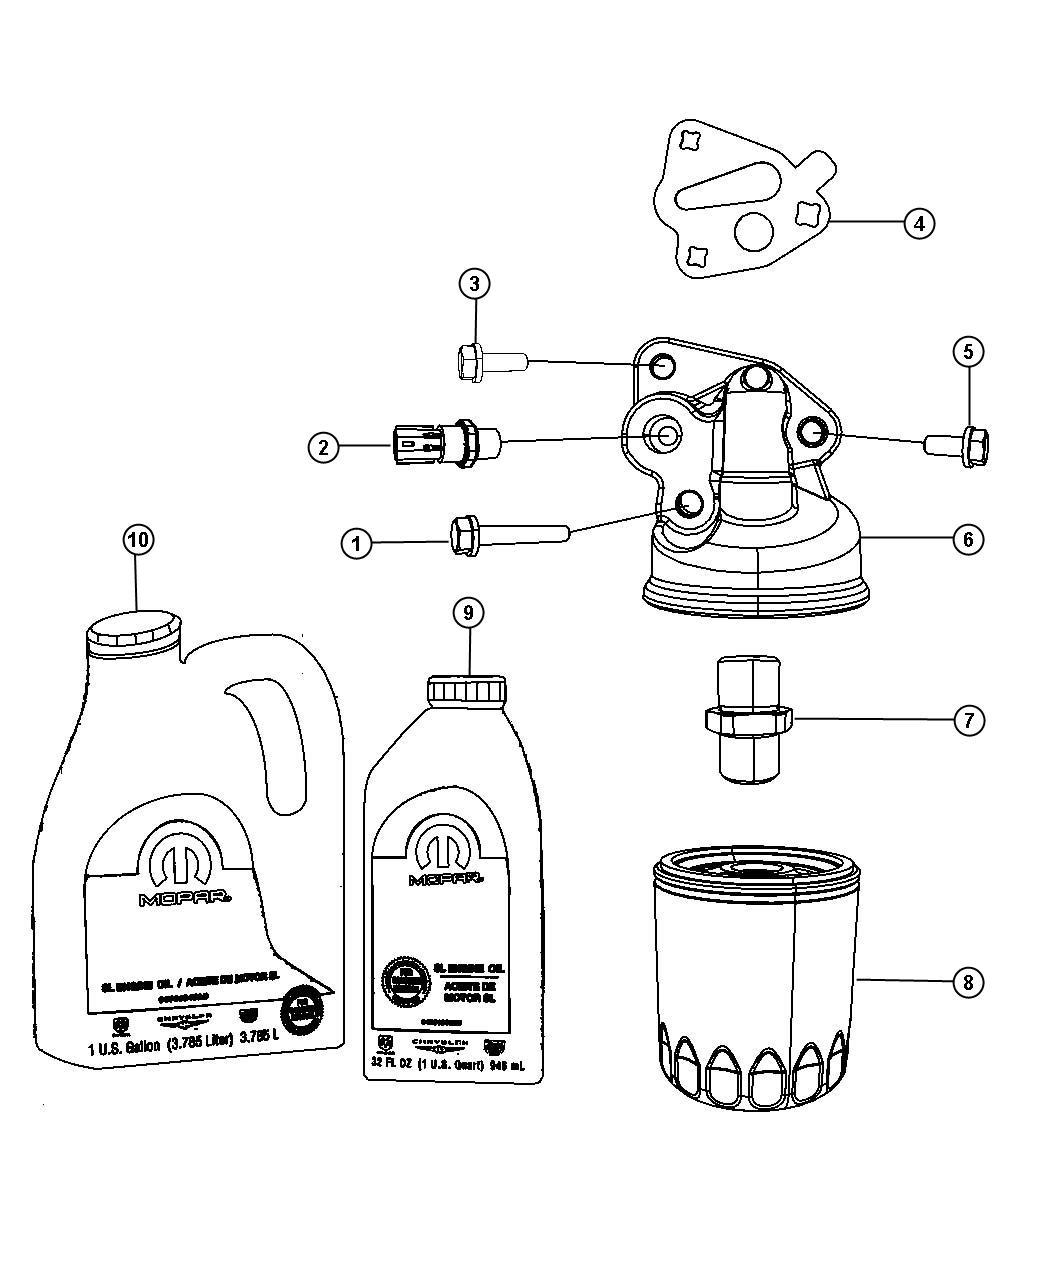 2005 dodge sending unit  switch  oil pressure  drivetrain  enginetransmission  ees